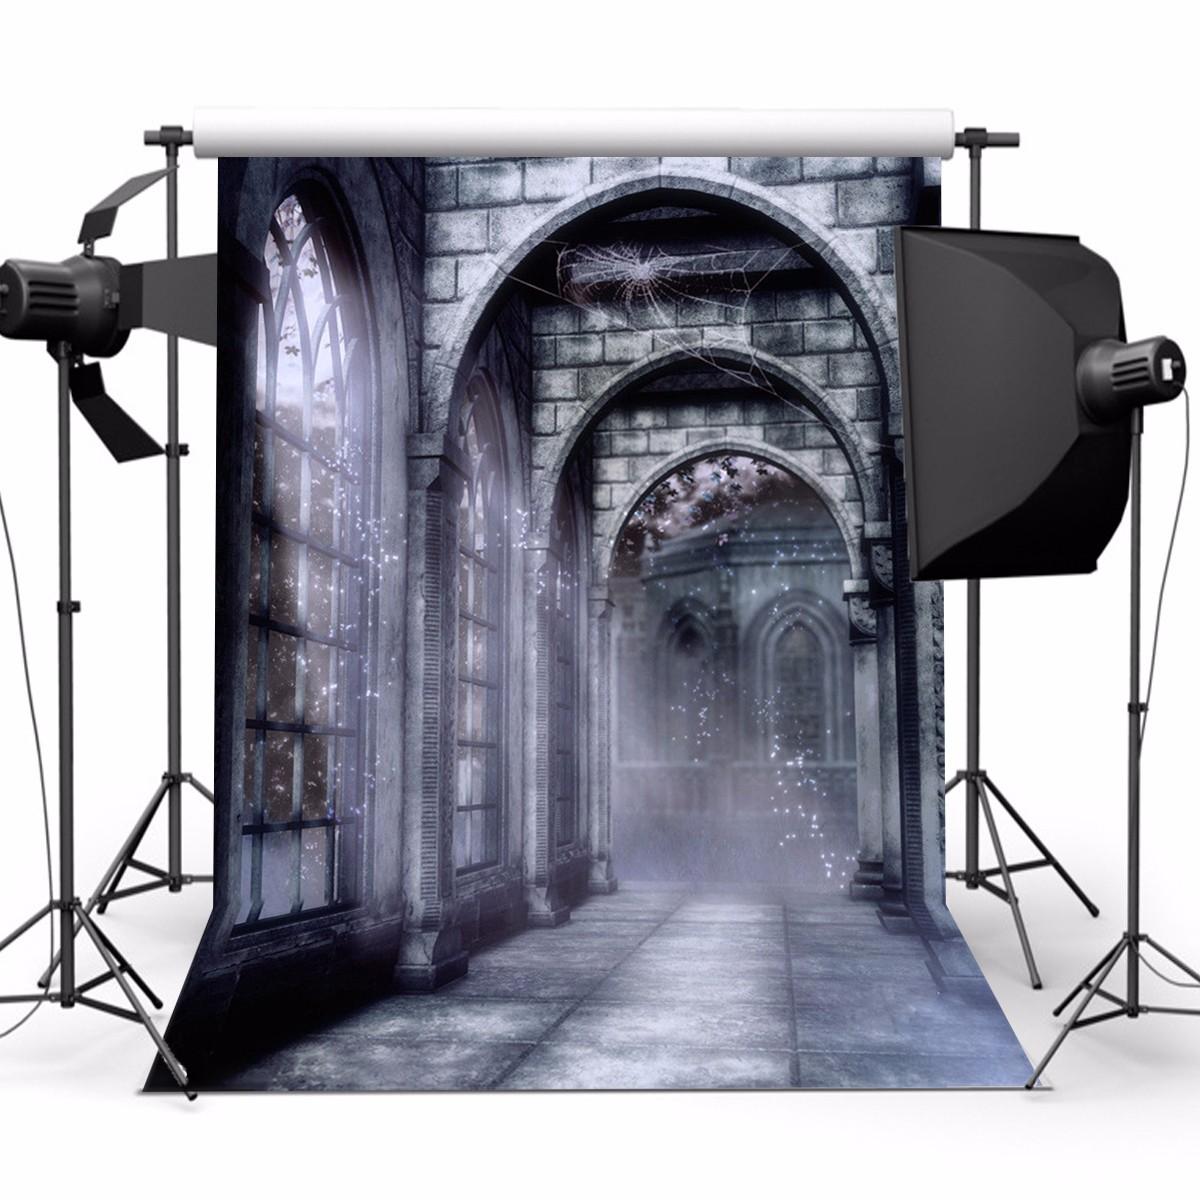 5x7ft Vinyl Retro Old Castle Backdrop Studio Photography Photo Background Props